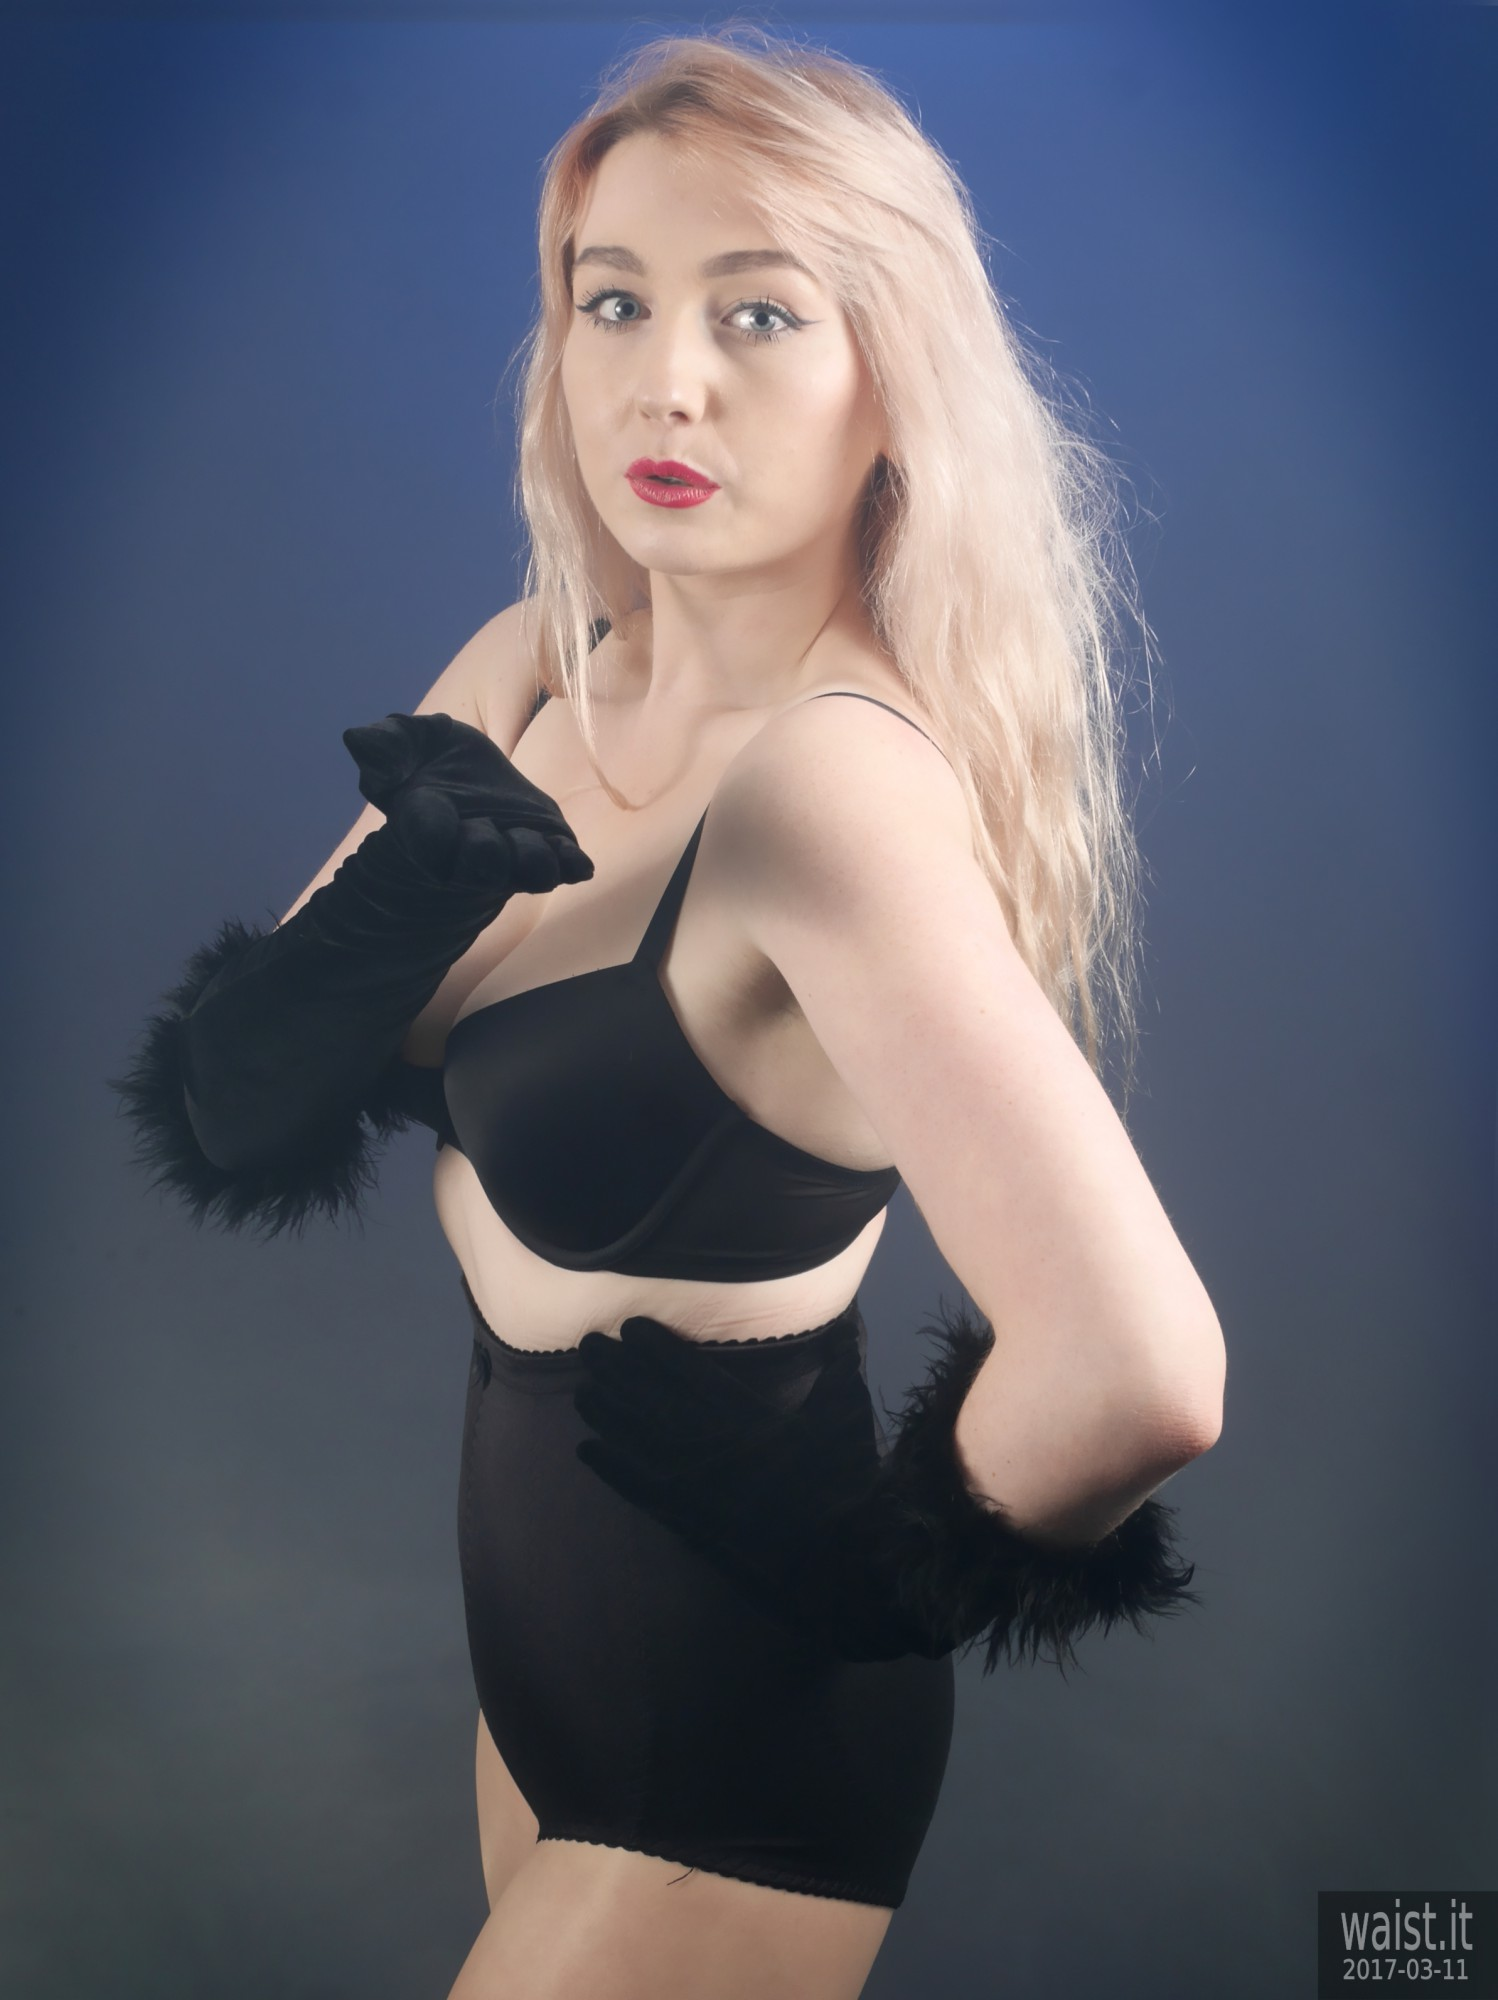 2017-03-11 LilyAmber bra and style 210 pantie girdle